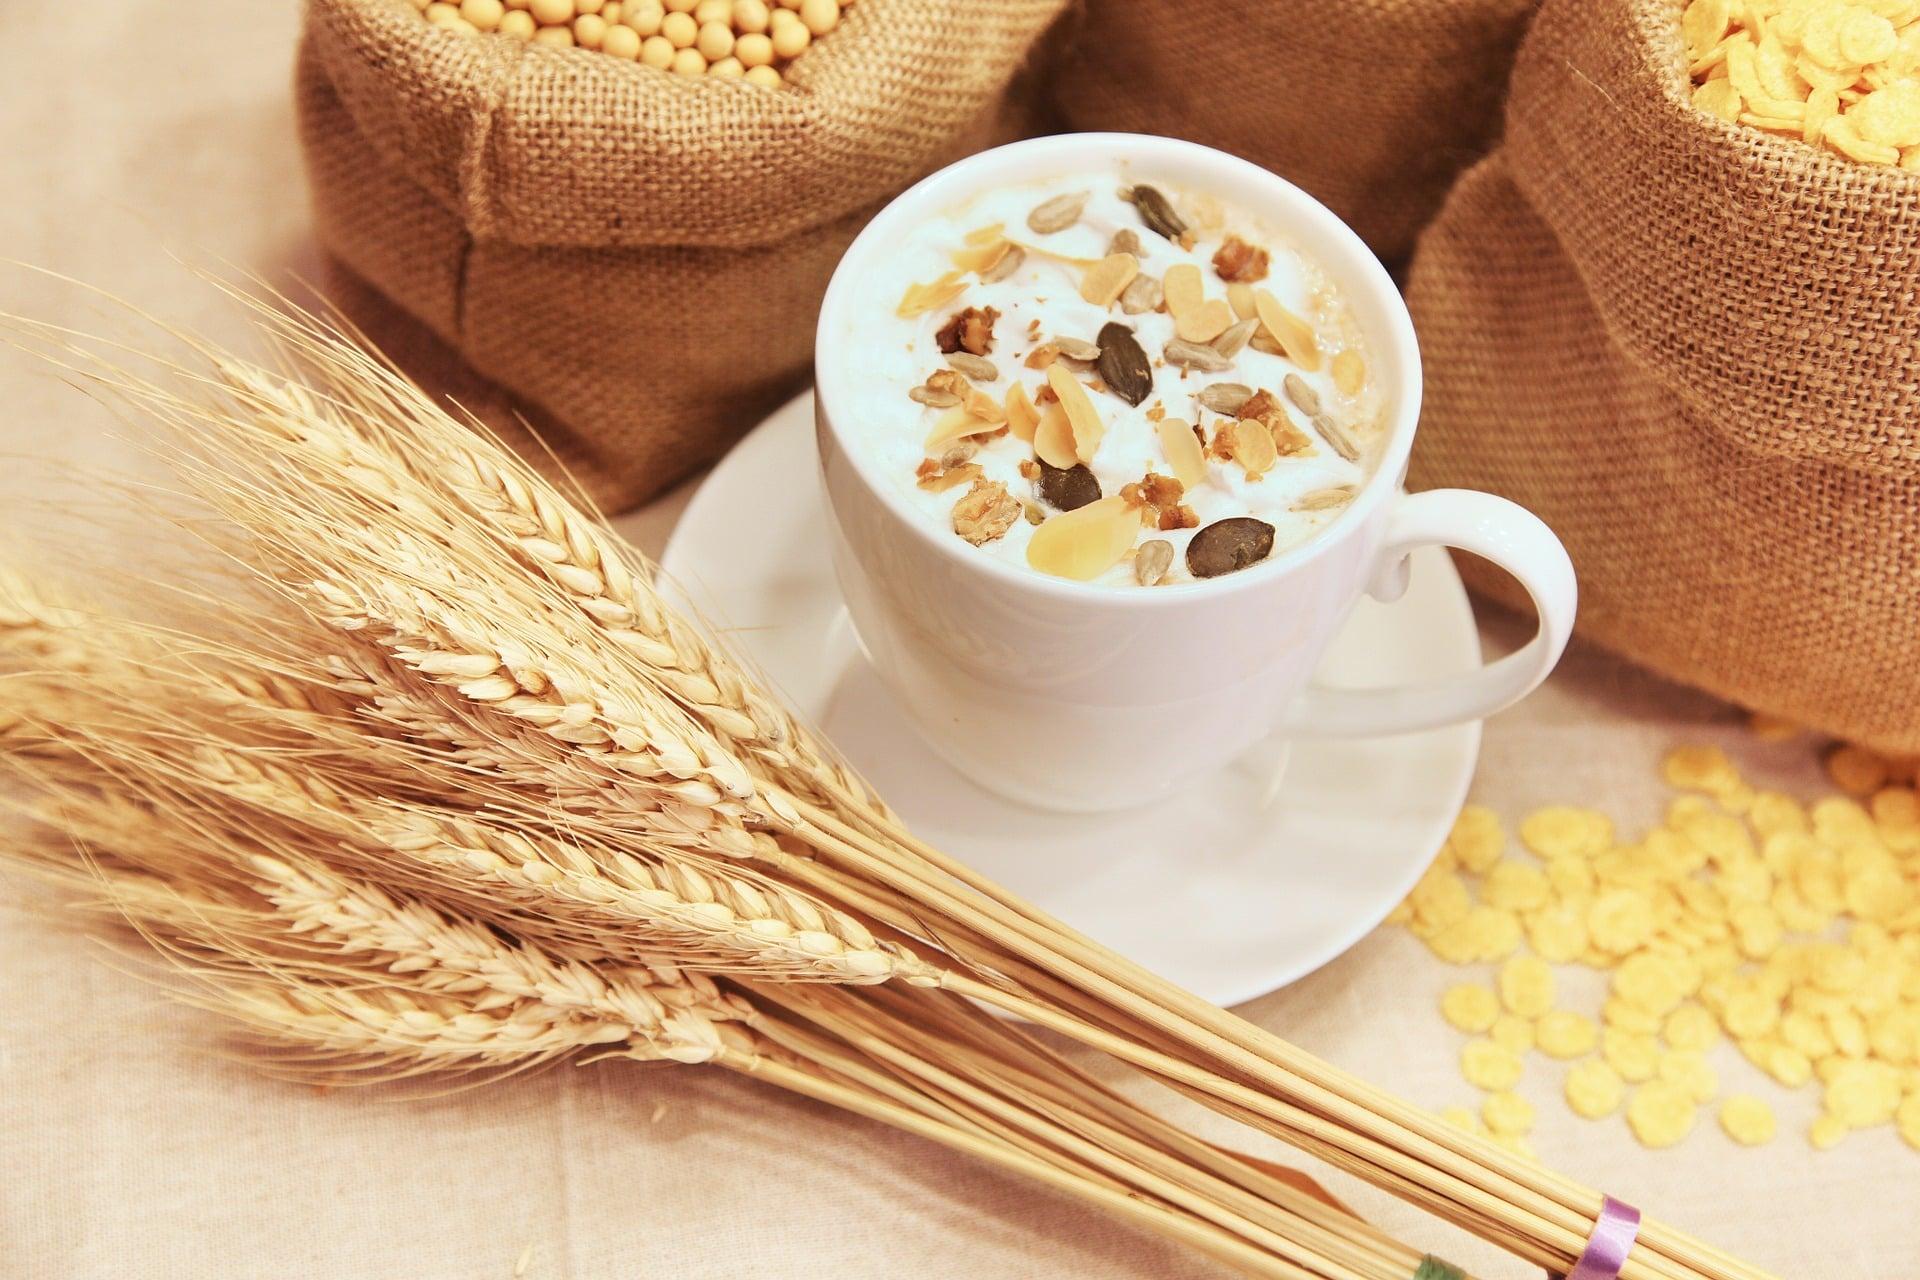 mangiare fibre allontana le malattie